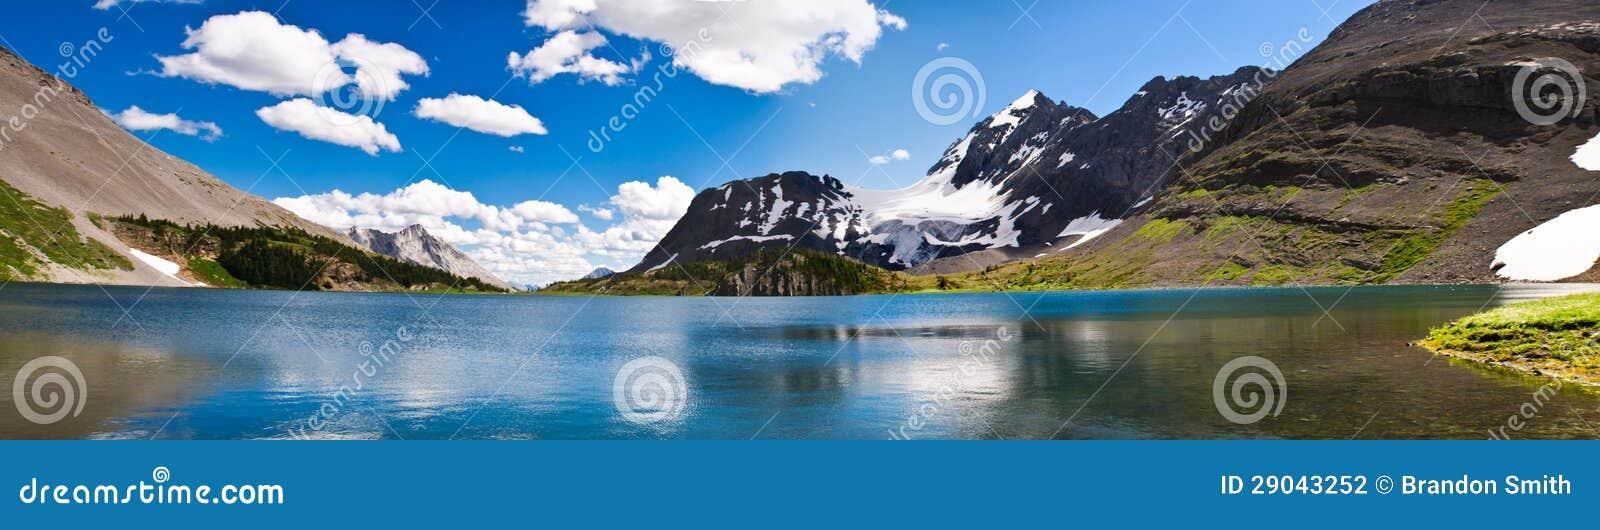 mount cdrom image linux EROAX